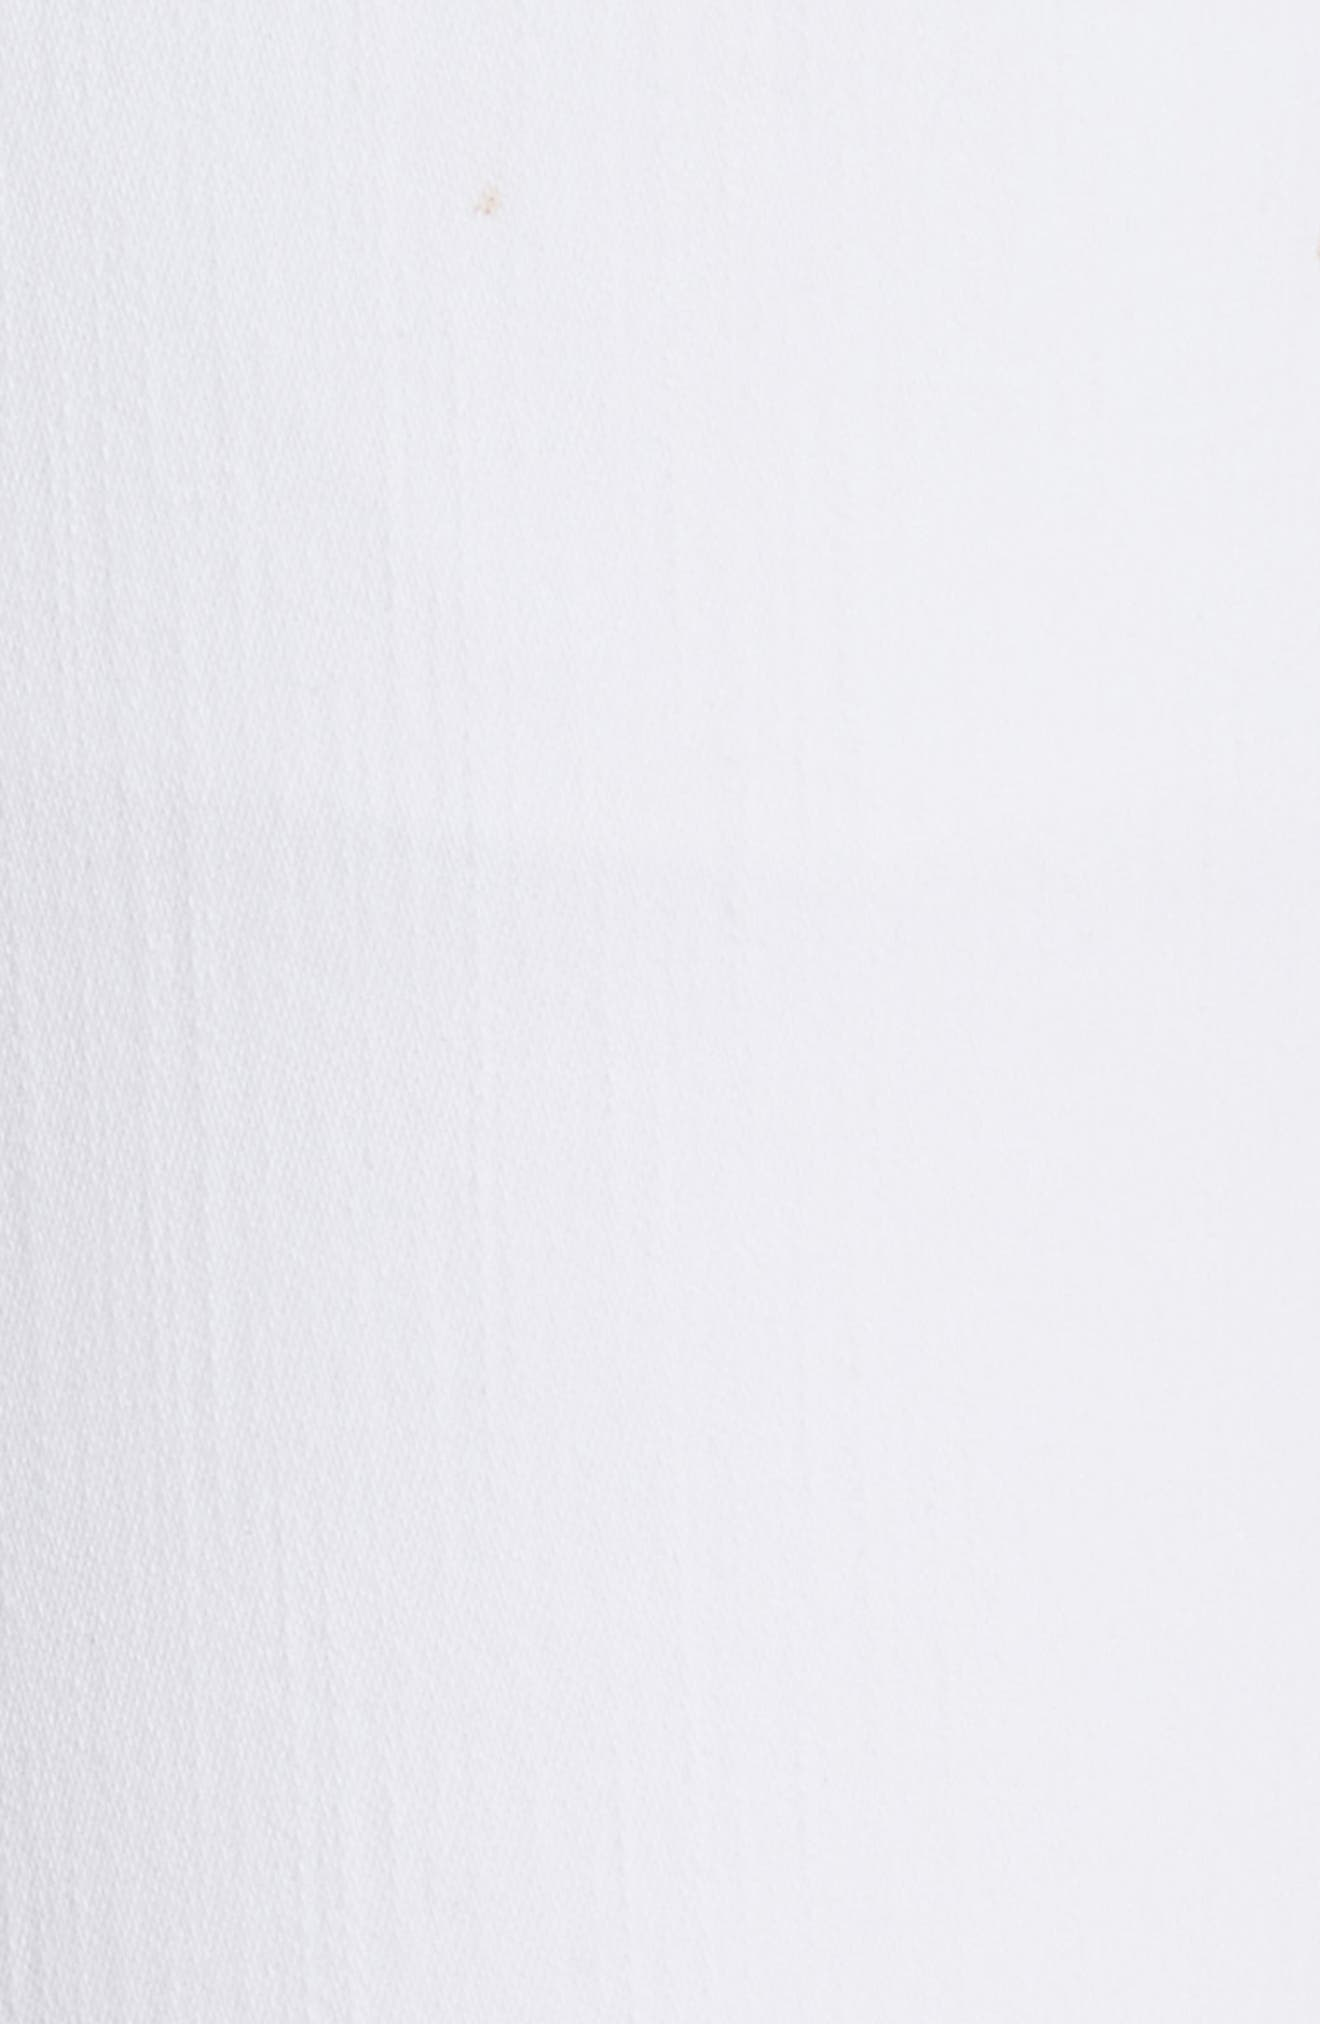 W2 Crop Skinny Jeans,                             Alternate thumbnail 5, color,                             White Tear